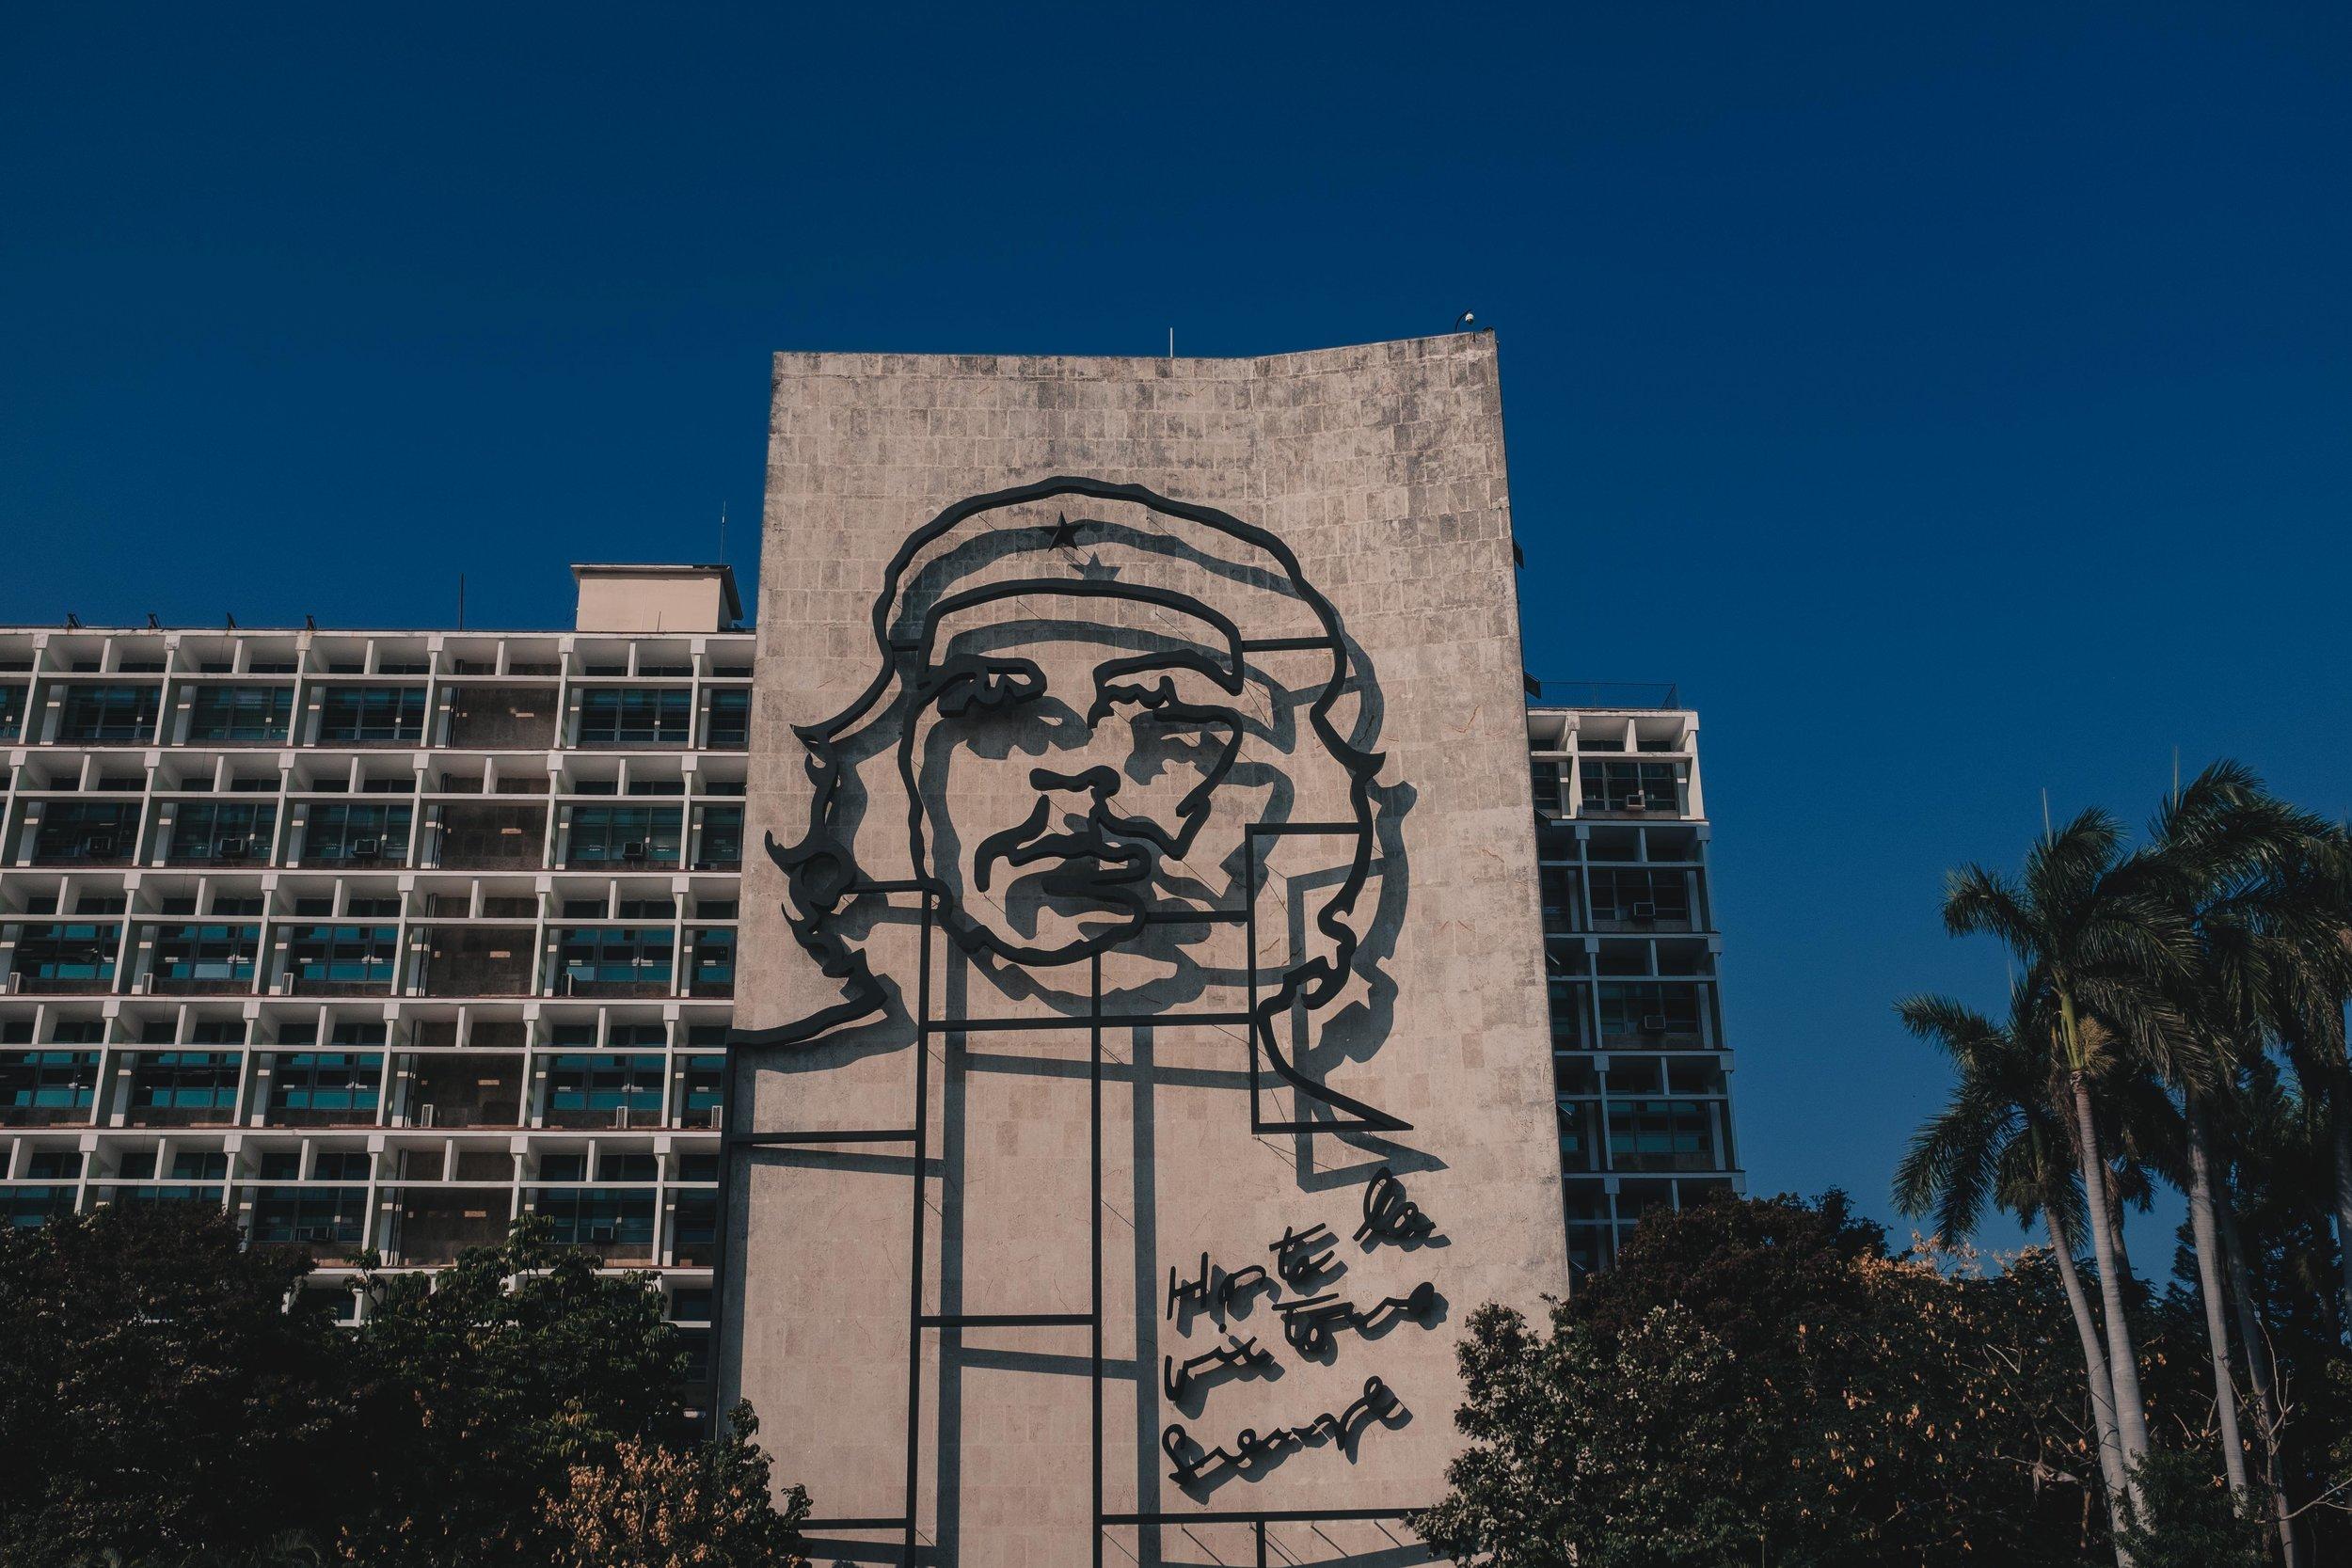 havana-che-guevera-plaza-revolucion.jpg